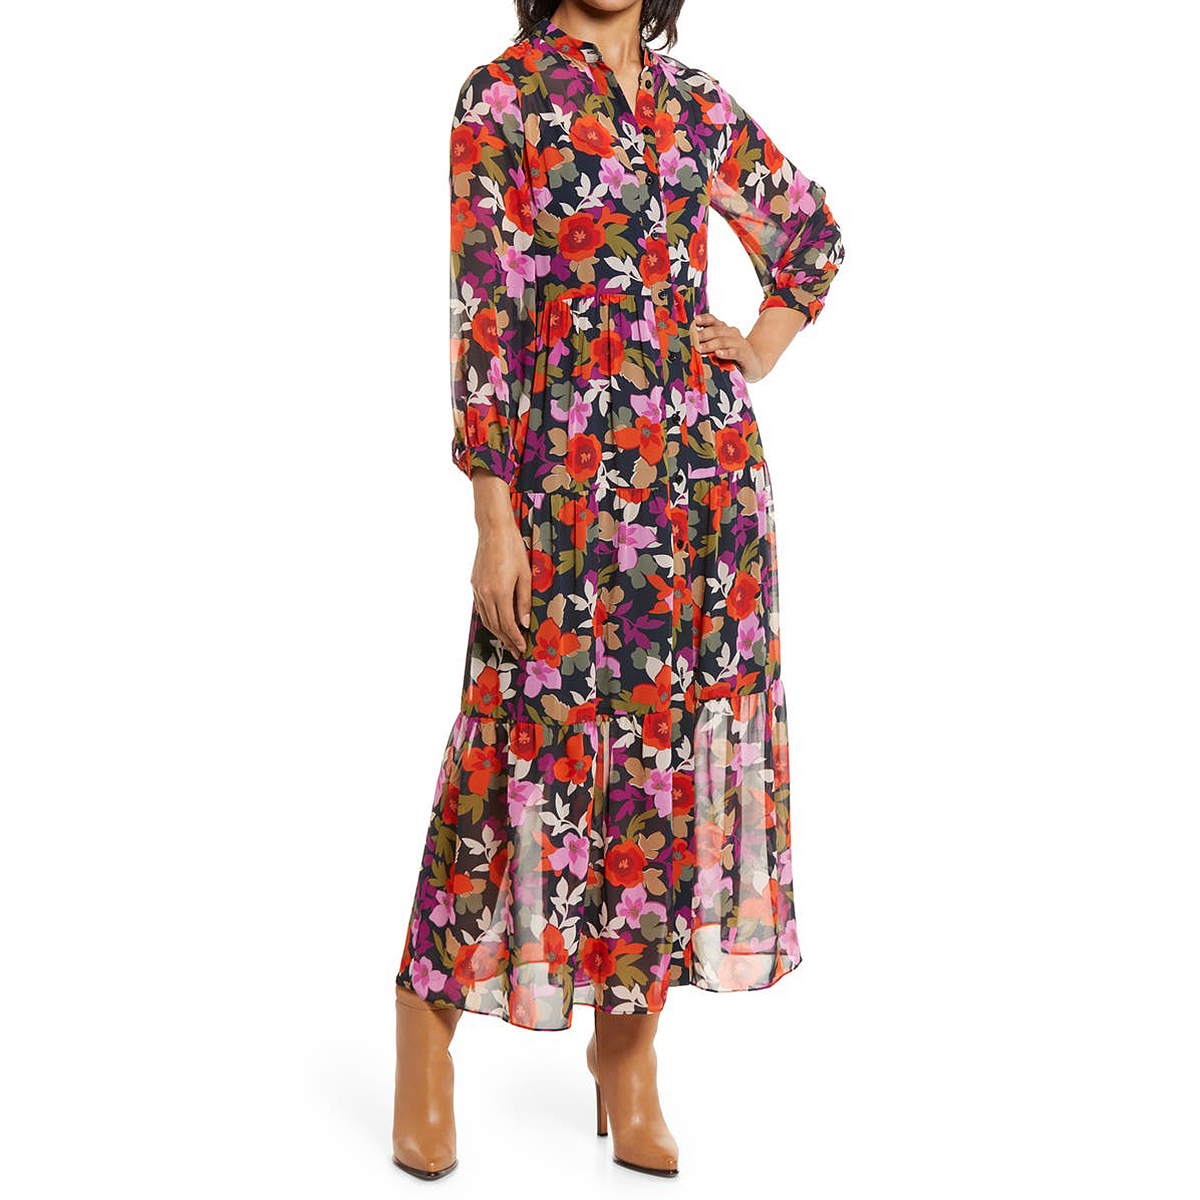 nordstrom-anniversary-sale-zara-style-maggy-london-shirtdress